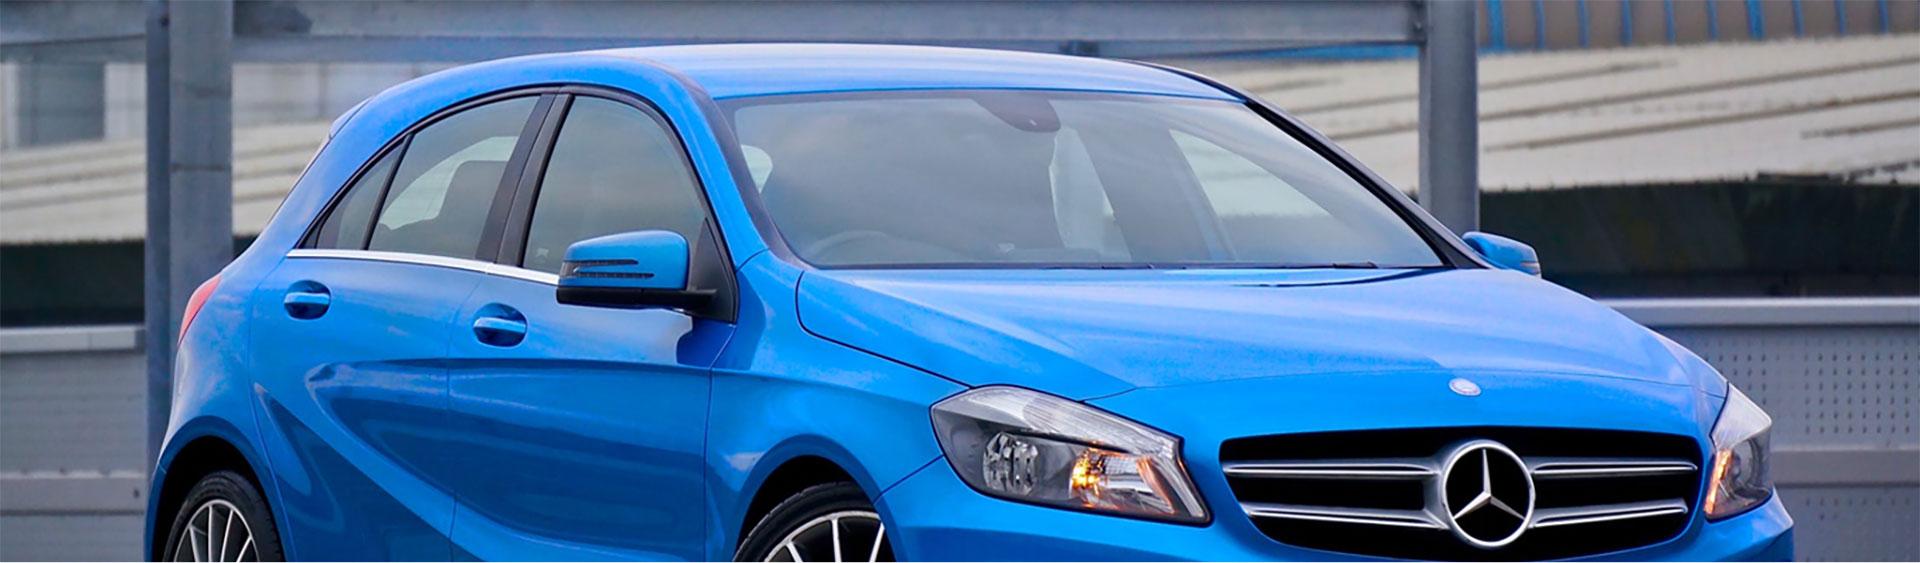 Parking Sensor System Online in Philippines - L A  Car